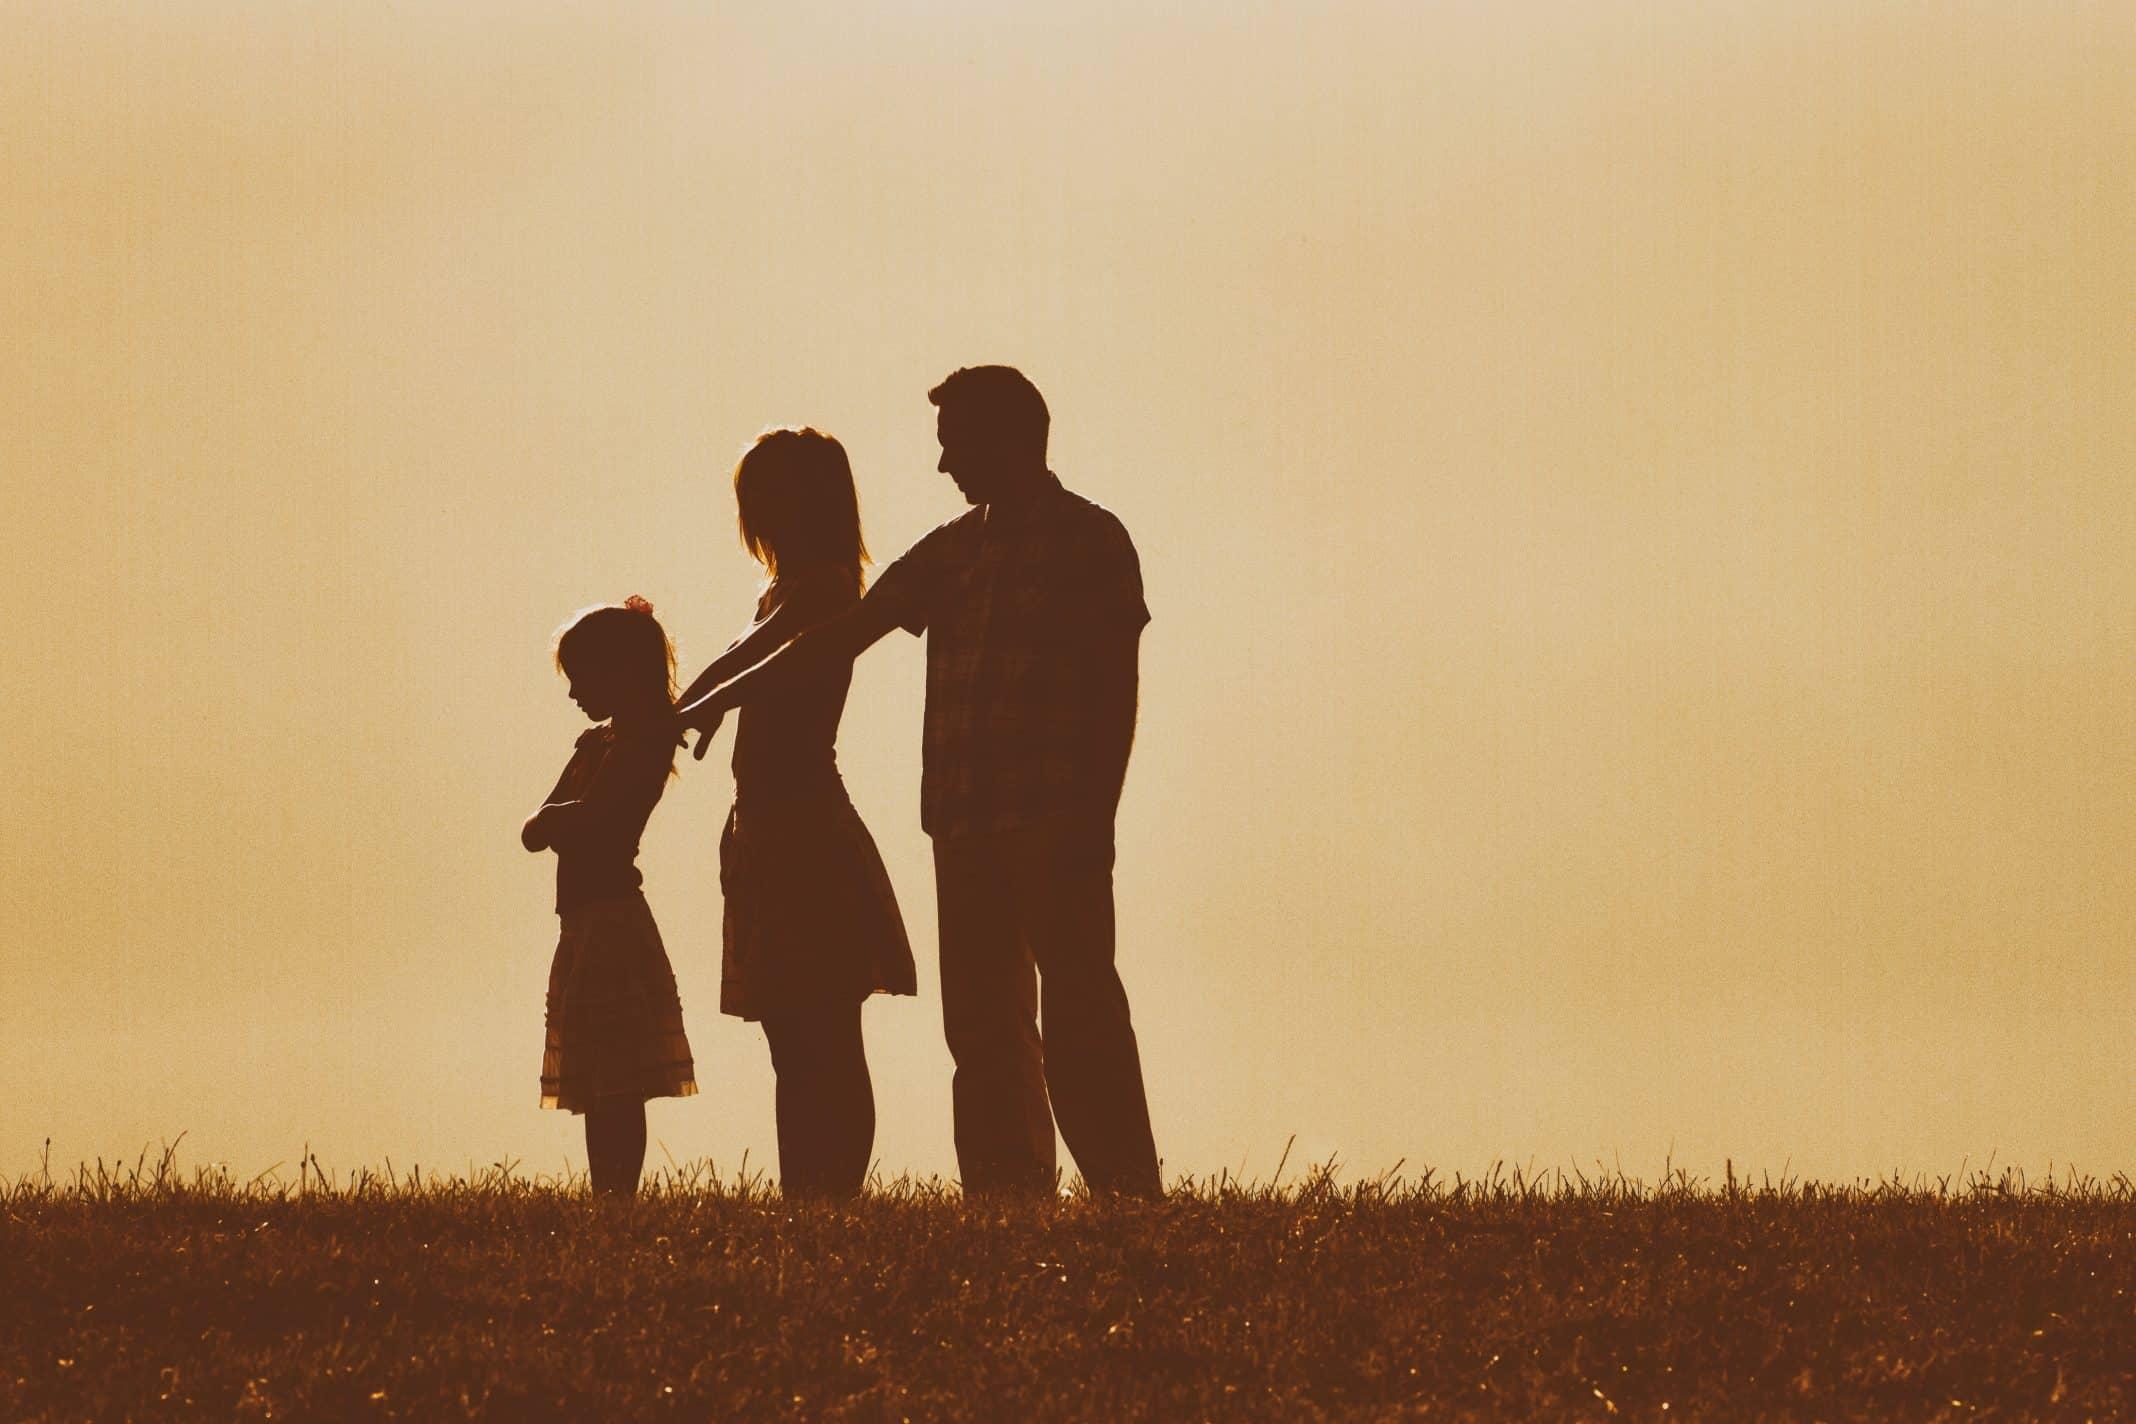 Familie Konflikt Thinkstock